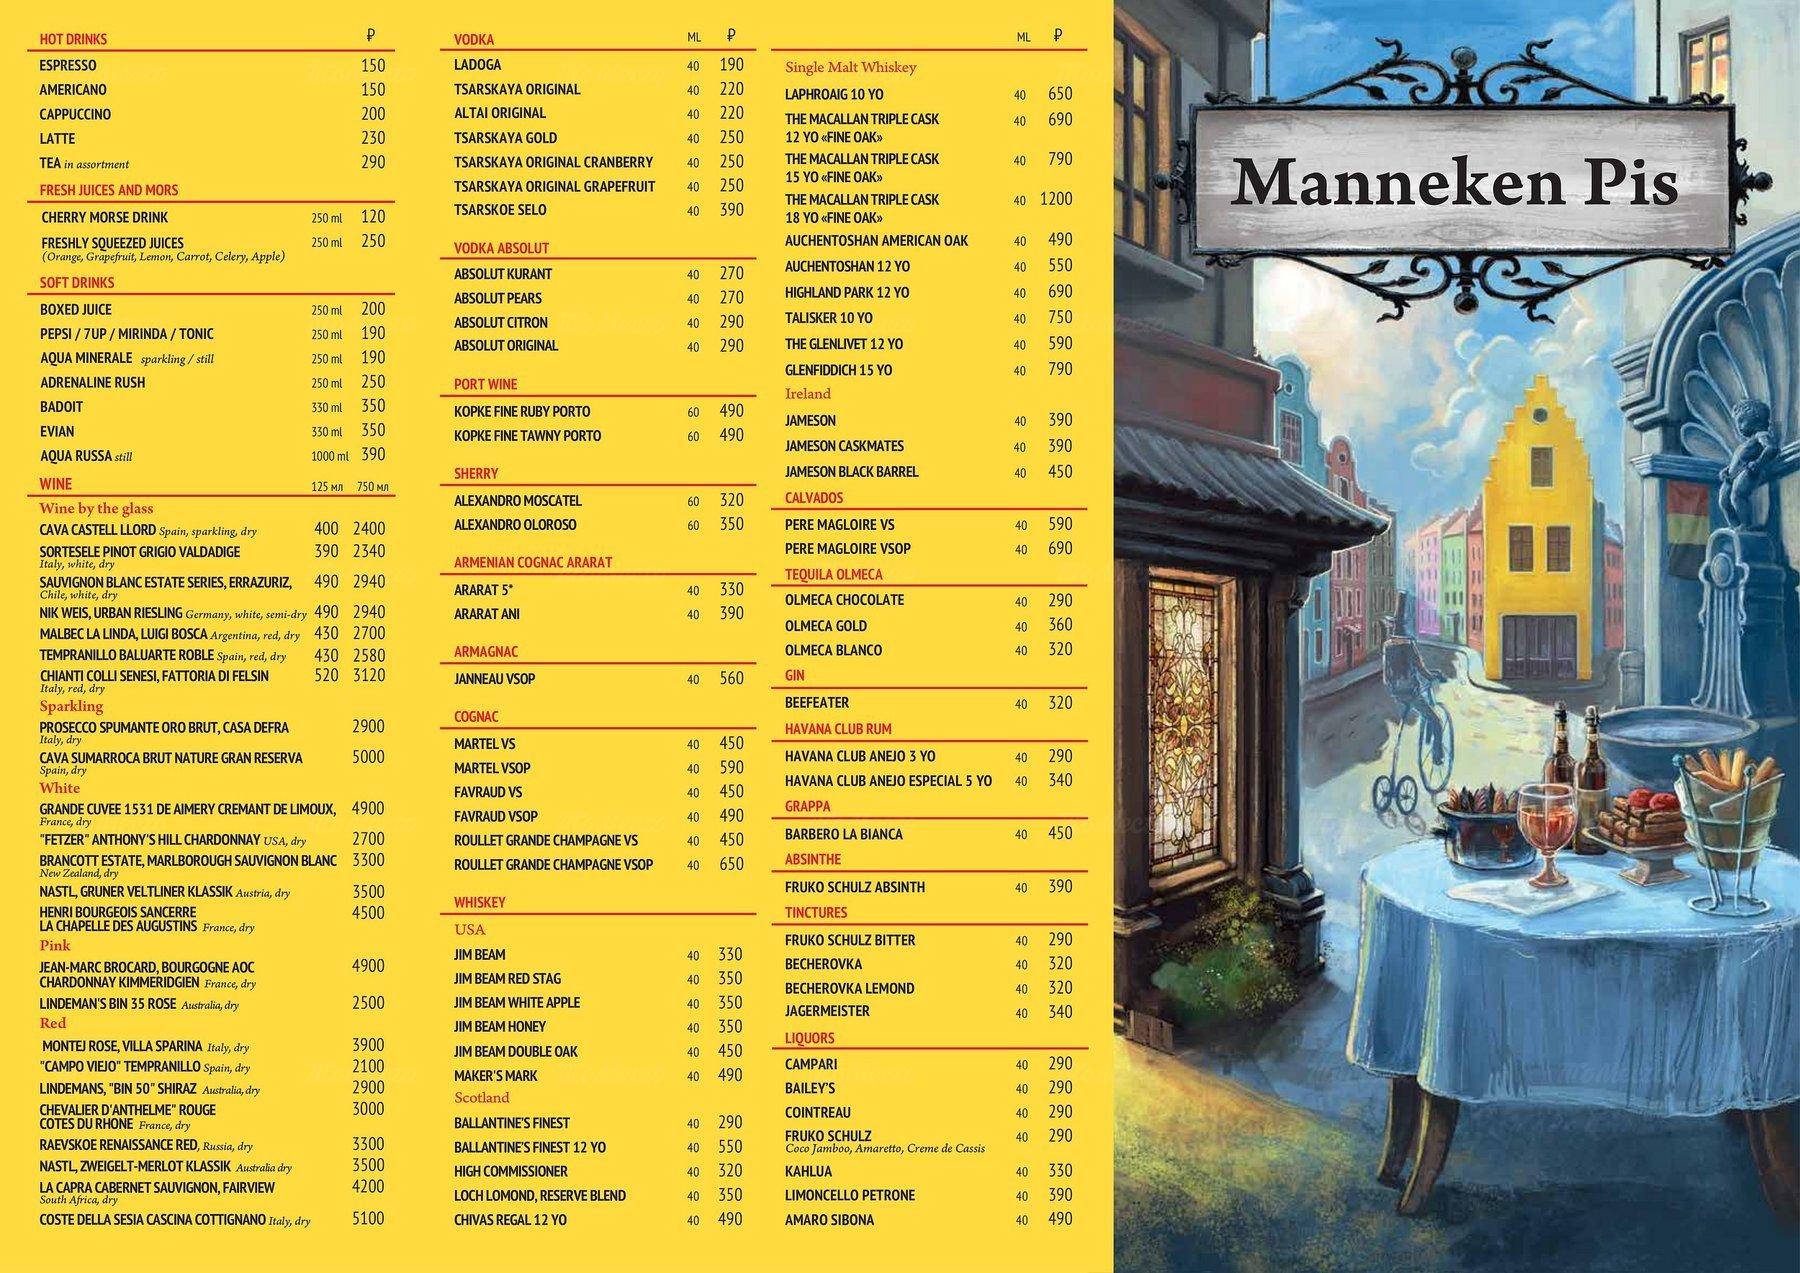 Меню паба Manneken Pis (Маннекен Пис) на Петровке фото 4